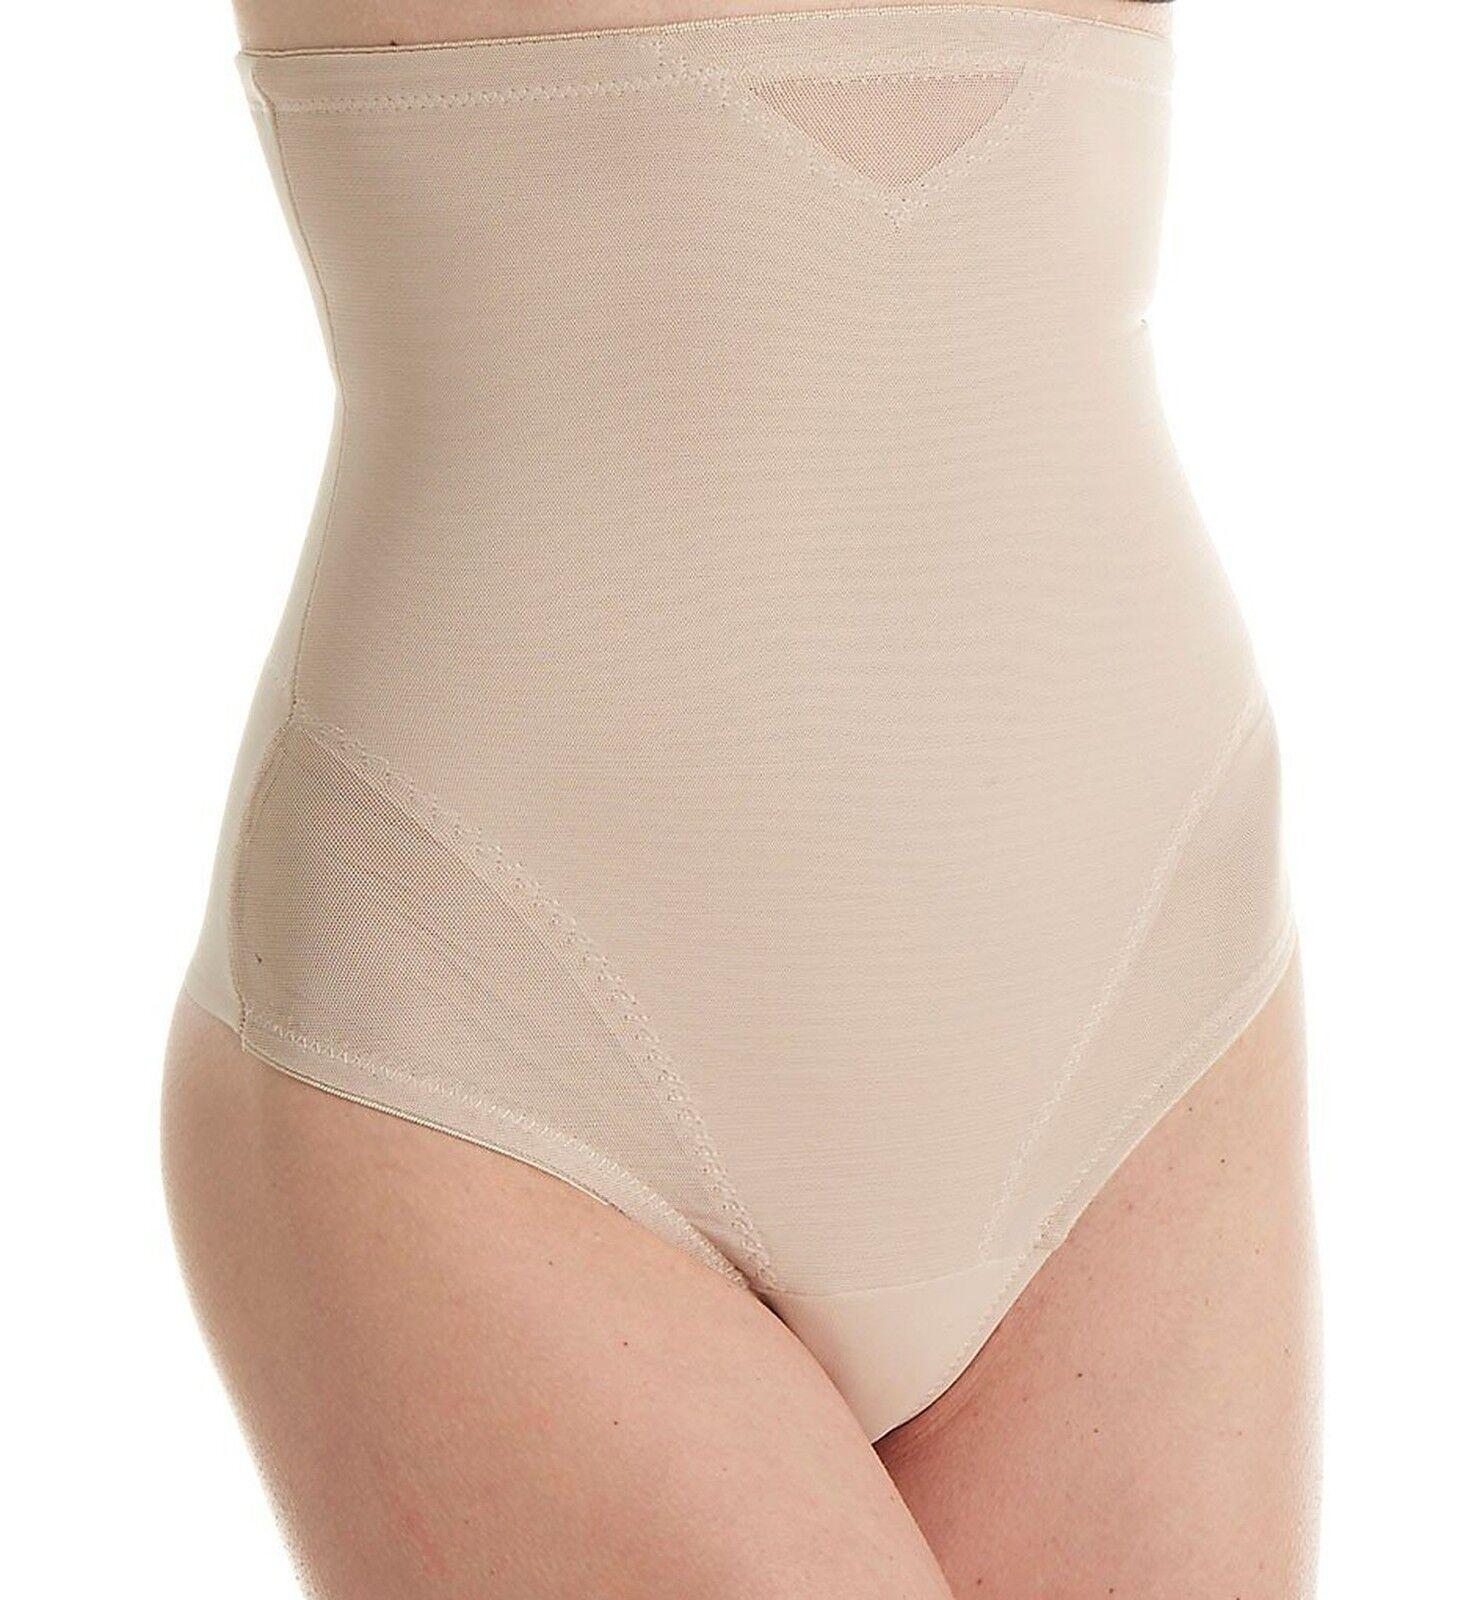 Miraclesuit Shapewear Women's Sheer Extra Firm Shaping High Waist Thong